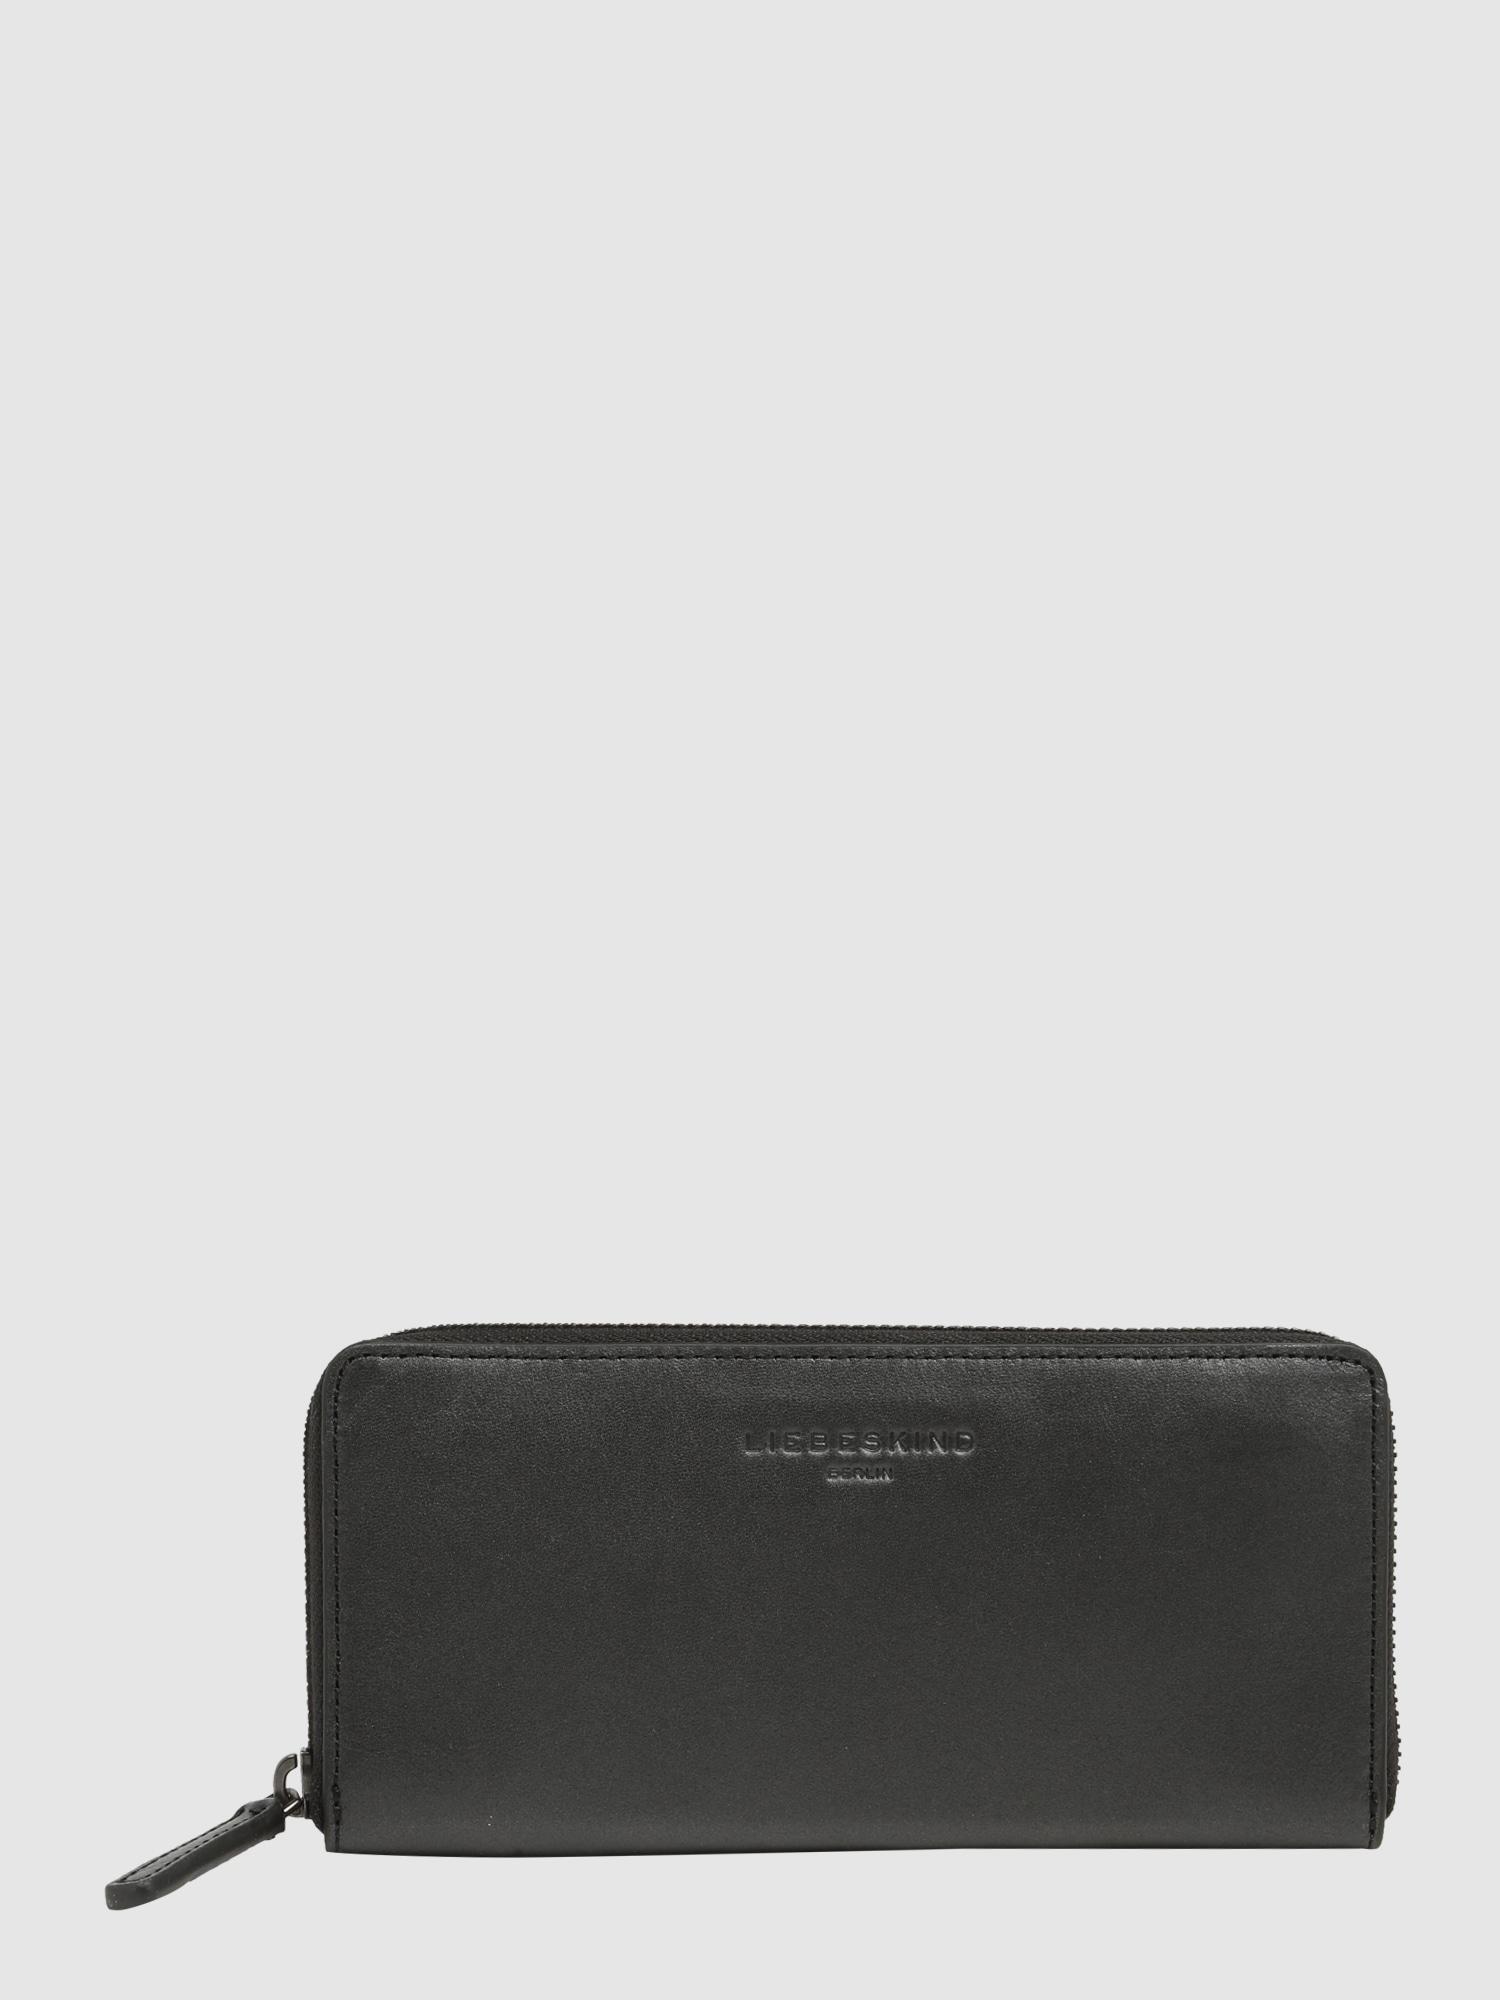 liebeskind berlin portemonnaie 39 sally 39 in schwarz about you. Black Bedroom Furniture Sets. Home Design Ideas